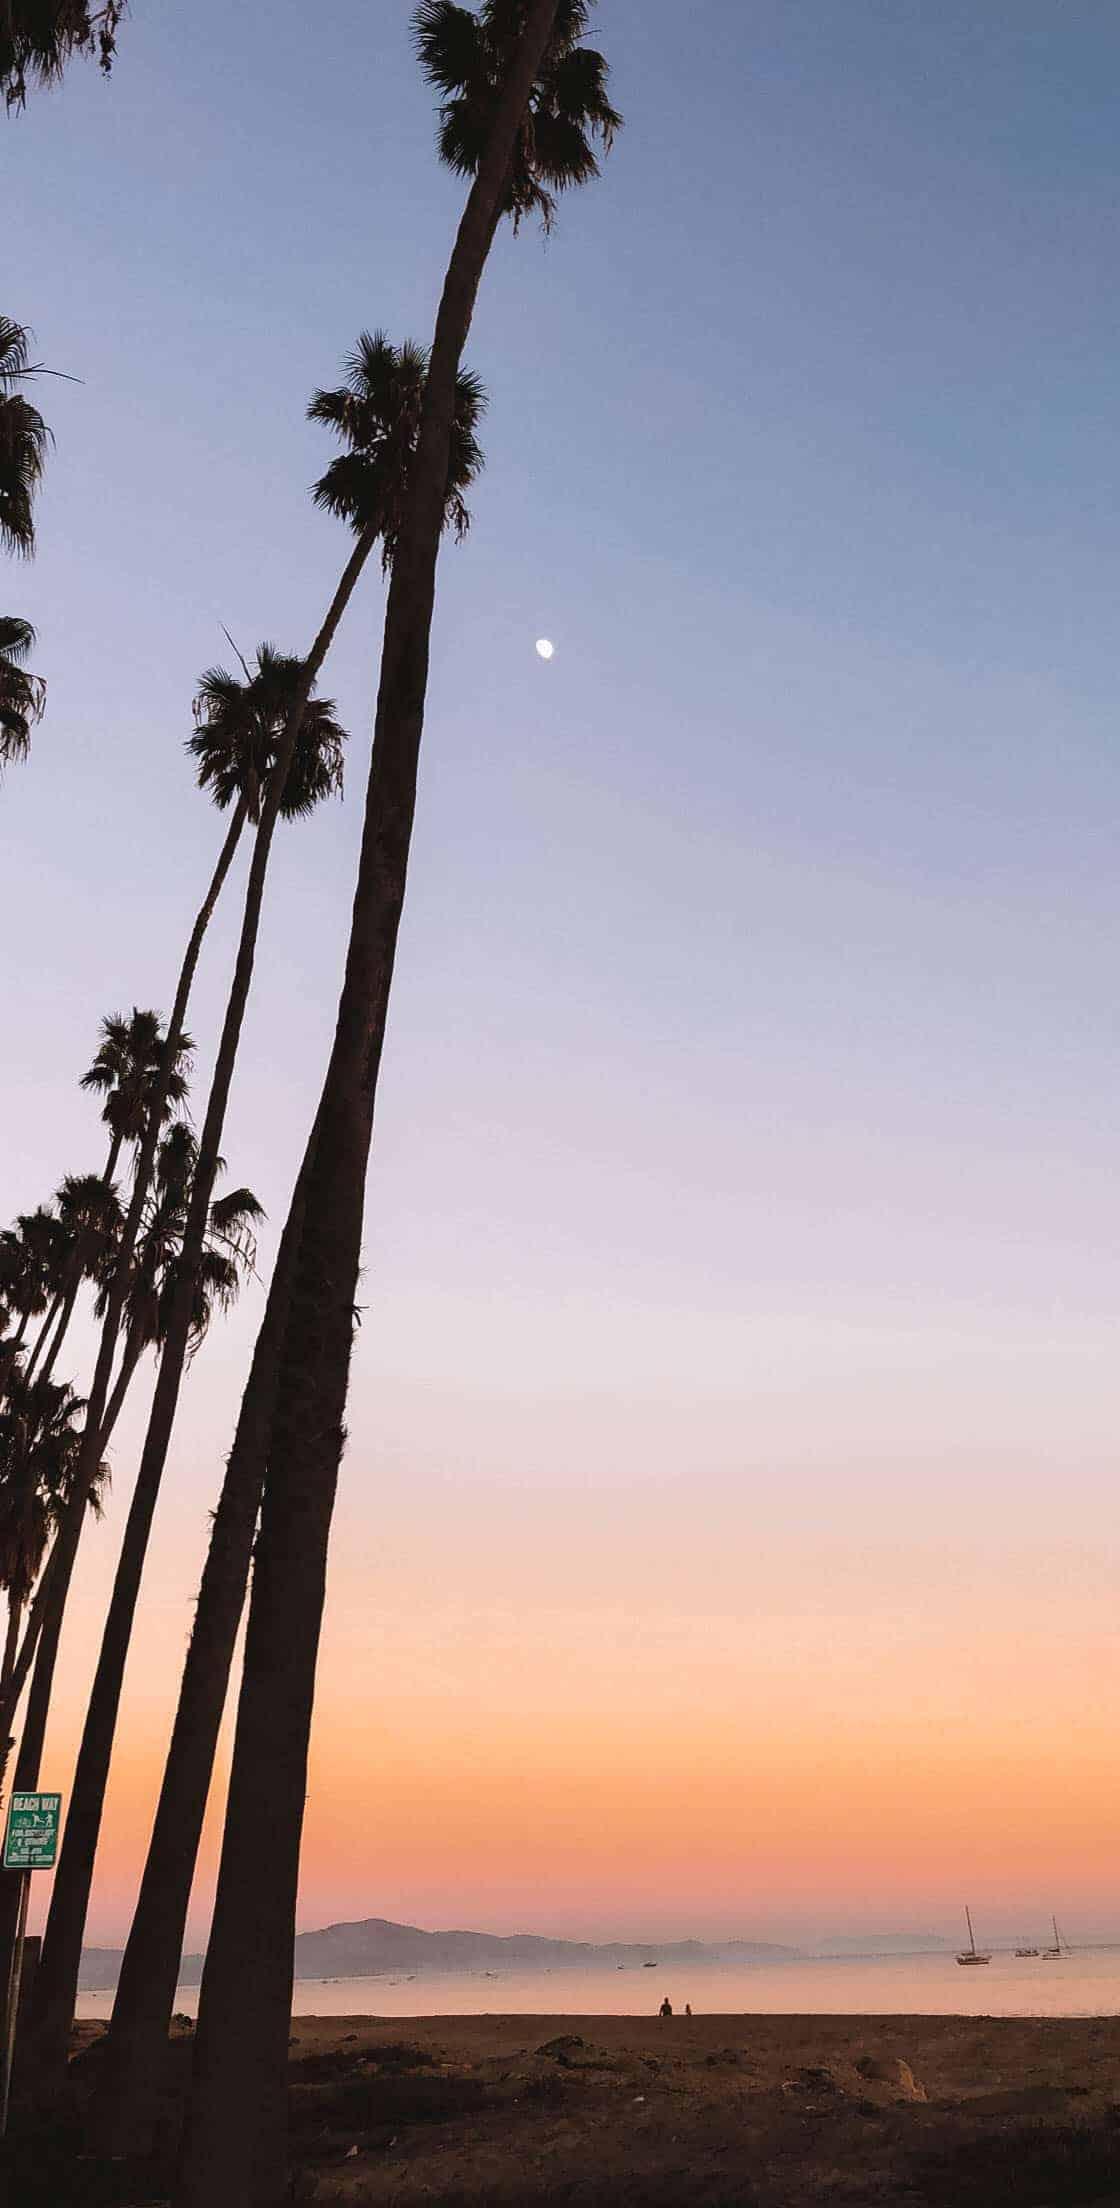 palm trees against an orange lit sky